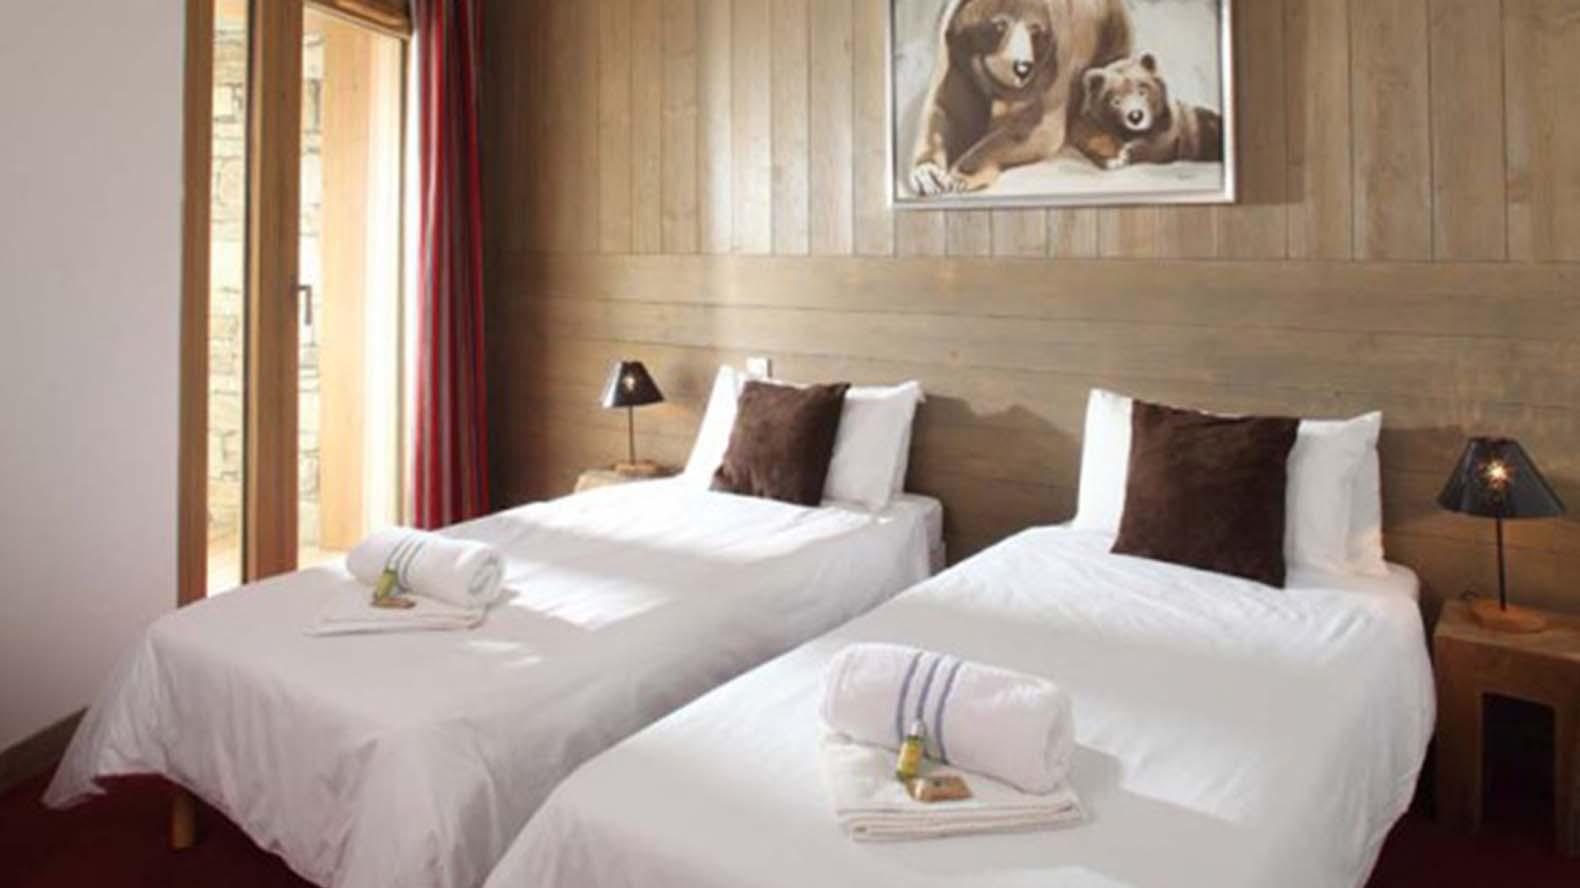 Bedroom, Chalet Carmen, Tignes, France